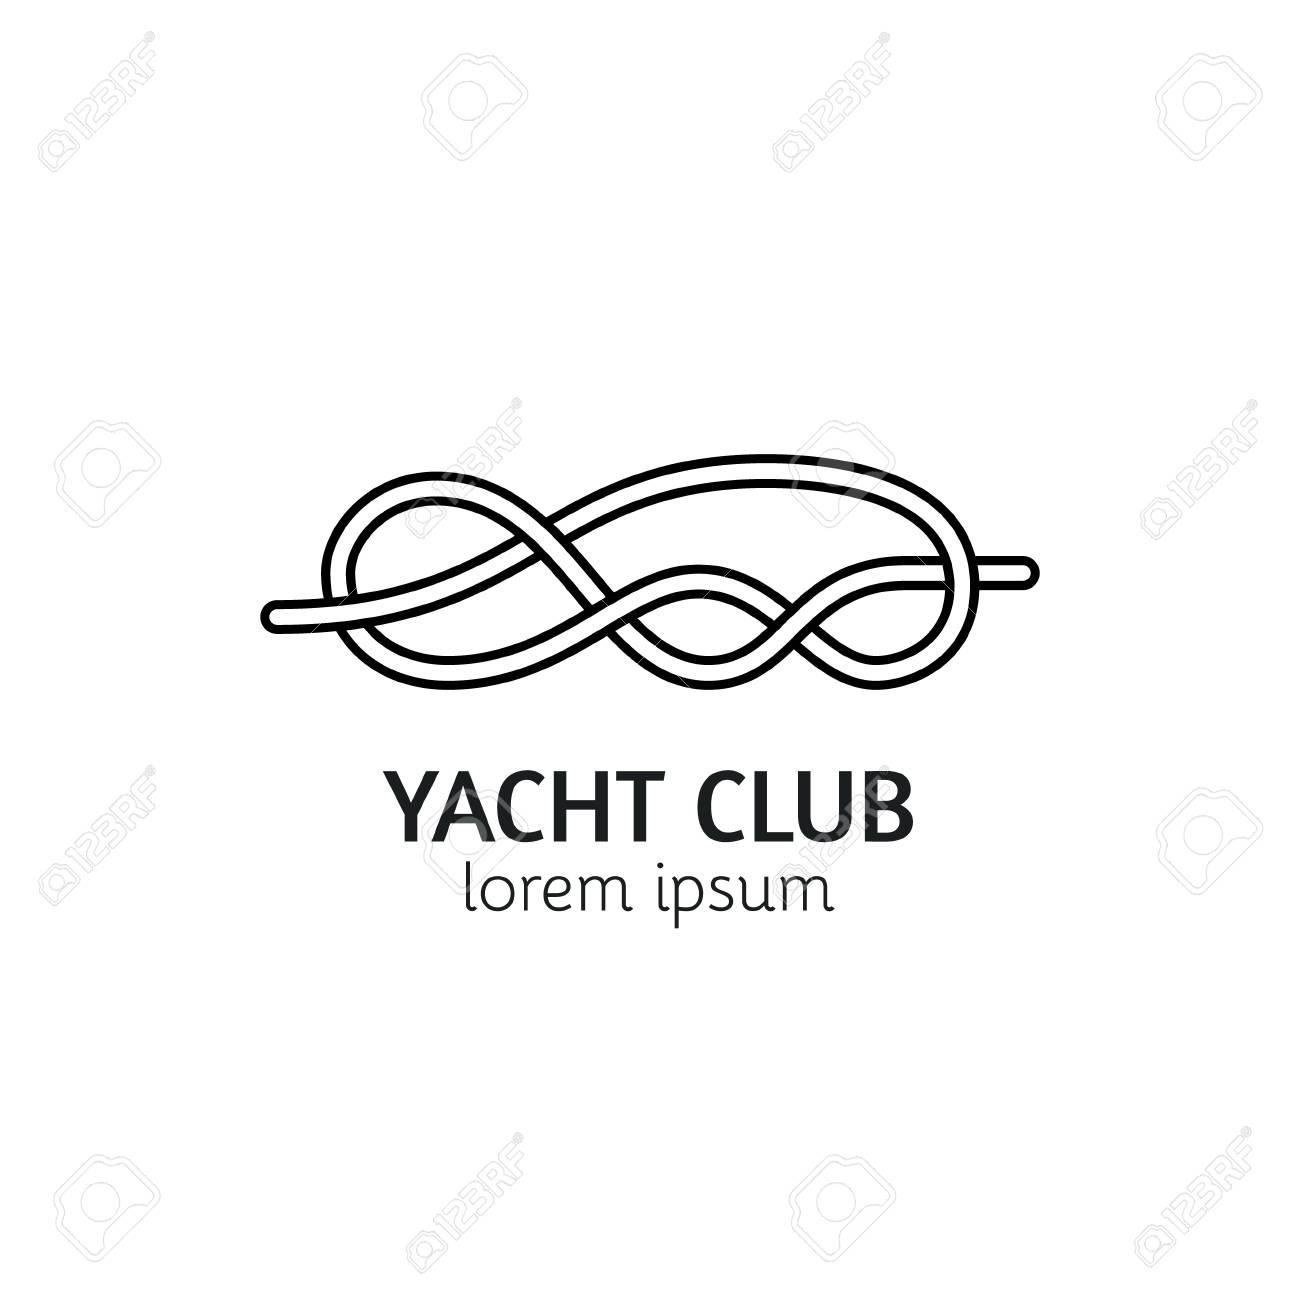 Unique Line Style Template With Sea Knot Editable Stroke Icon